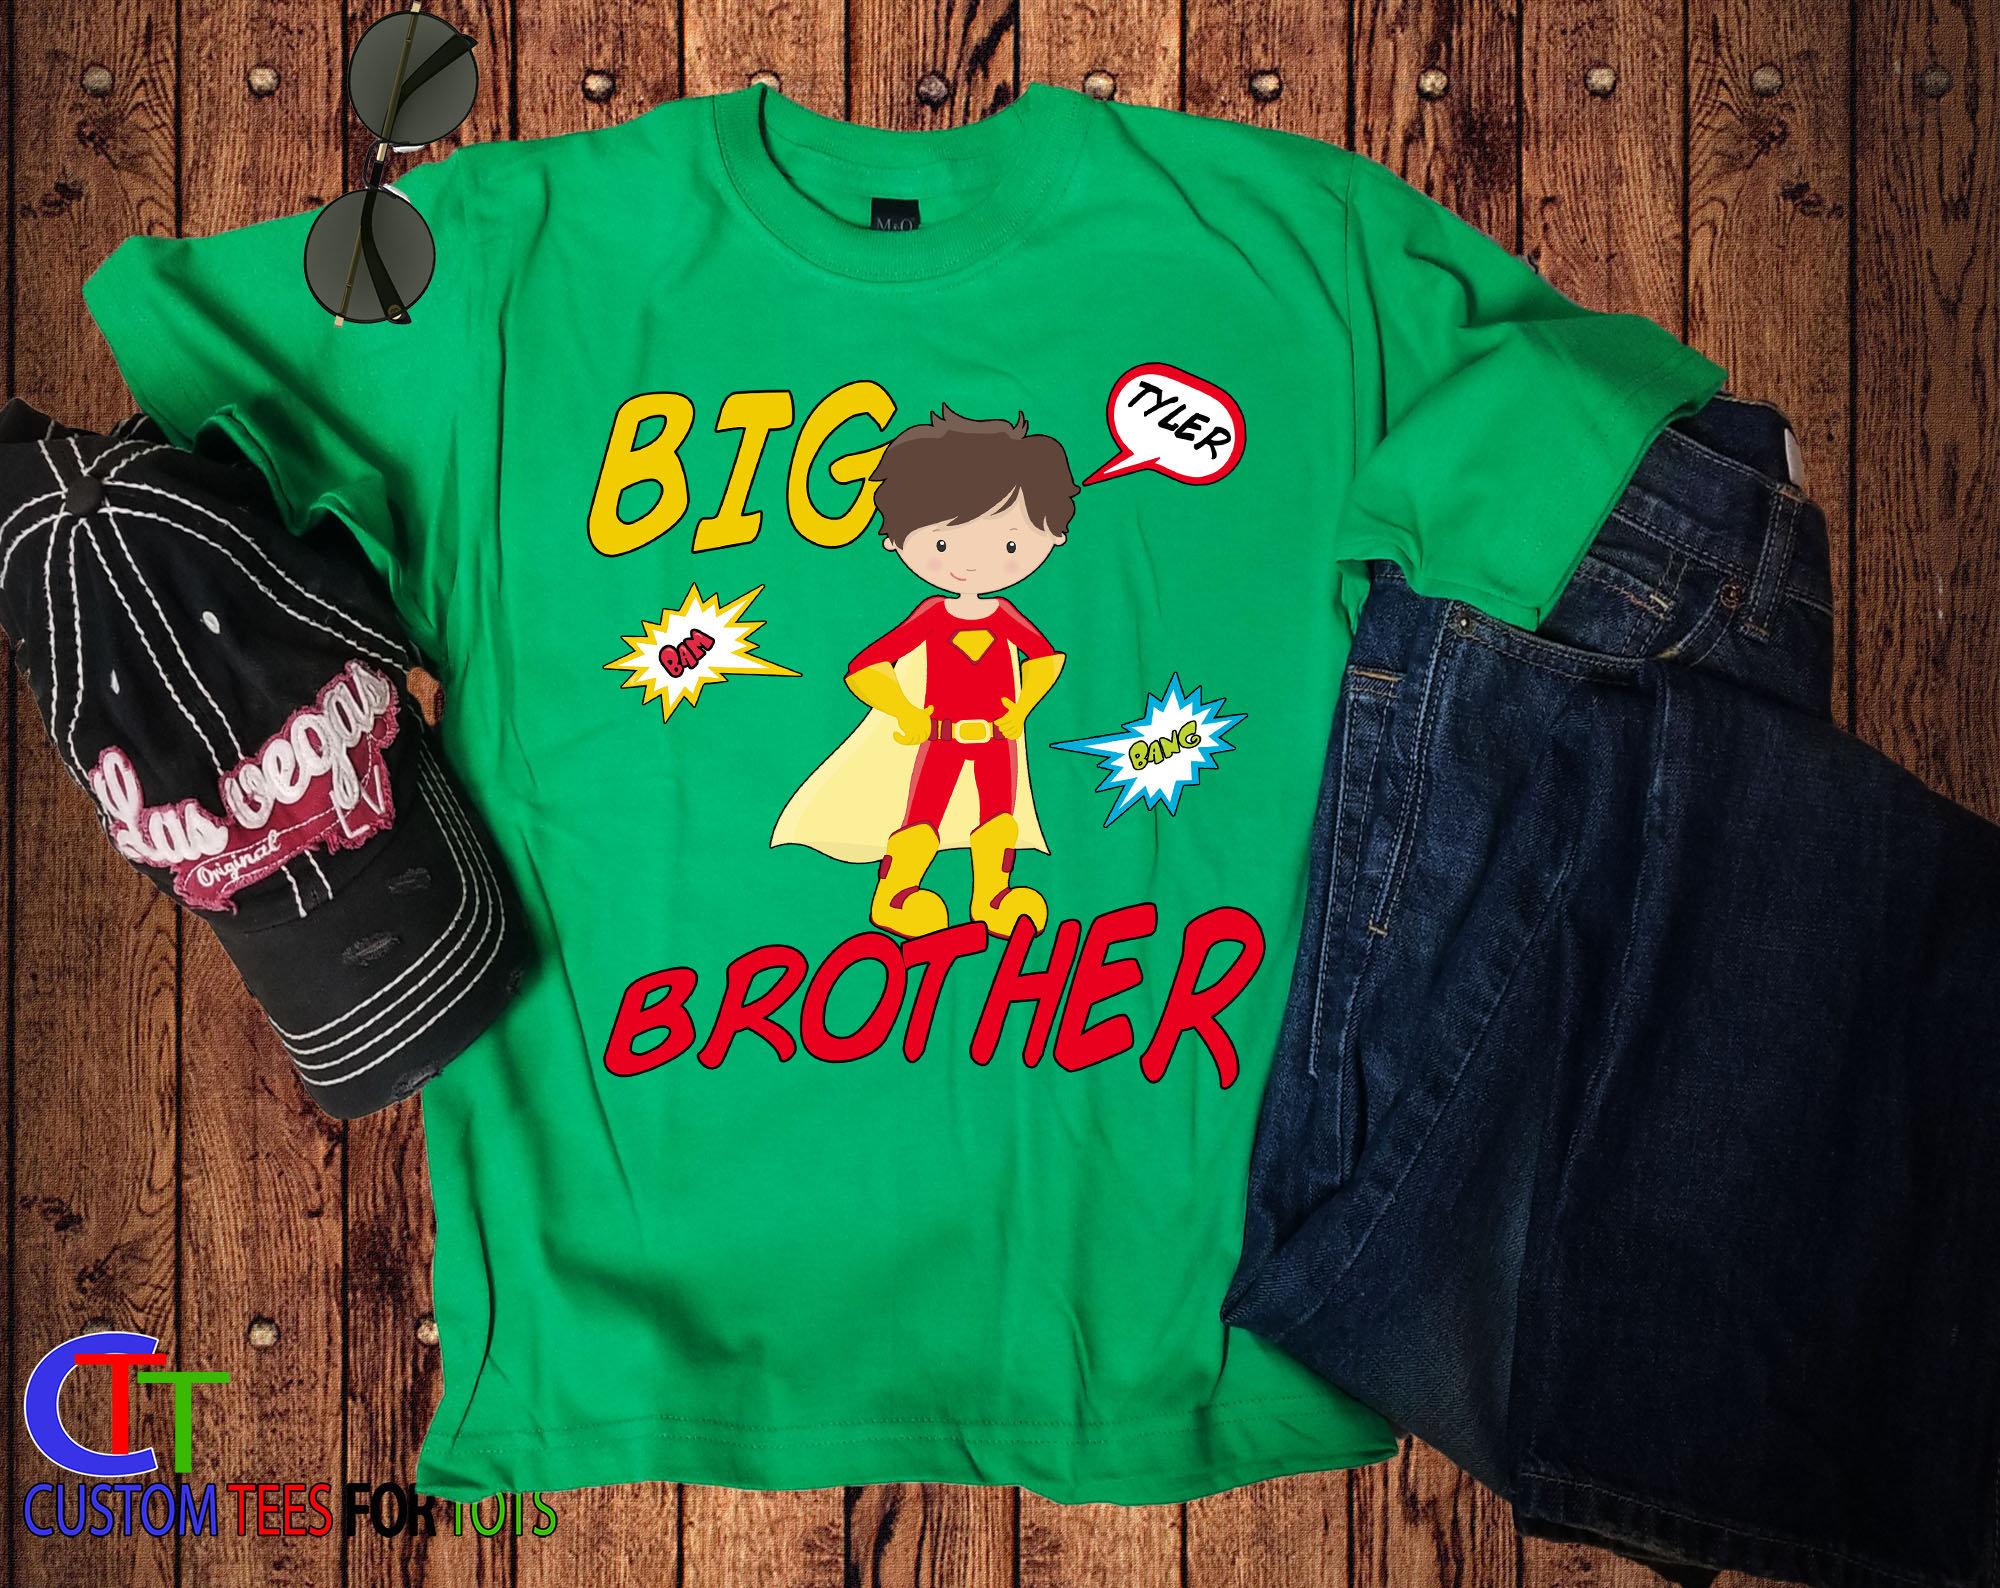 f59c47f8 Boys Superhero Shirt - Big Brother Superhero Shirt - Personalized Superhero  Shirt - Big Brother Announcement Shirt - Sibling Shirt